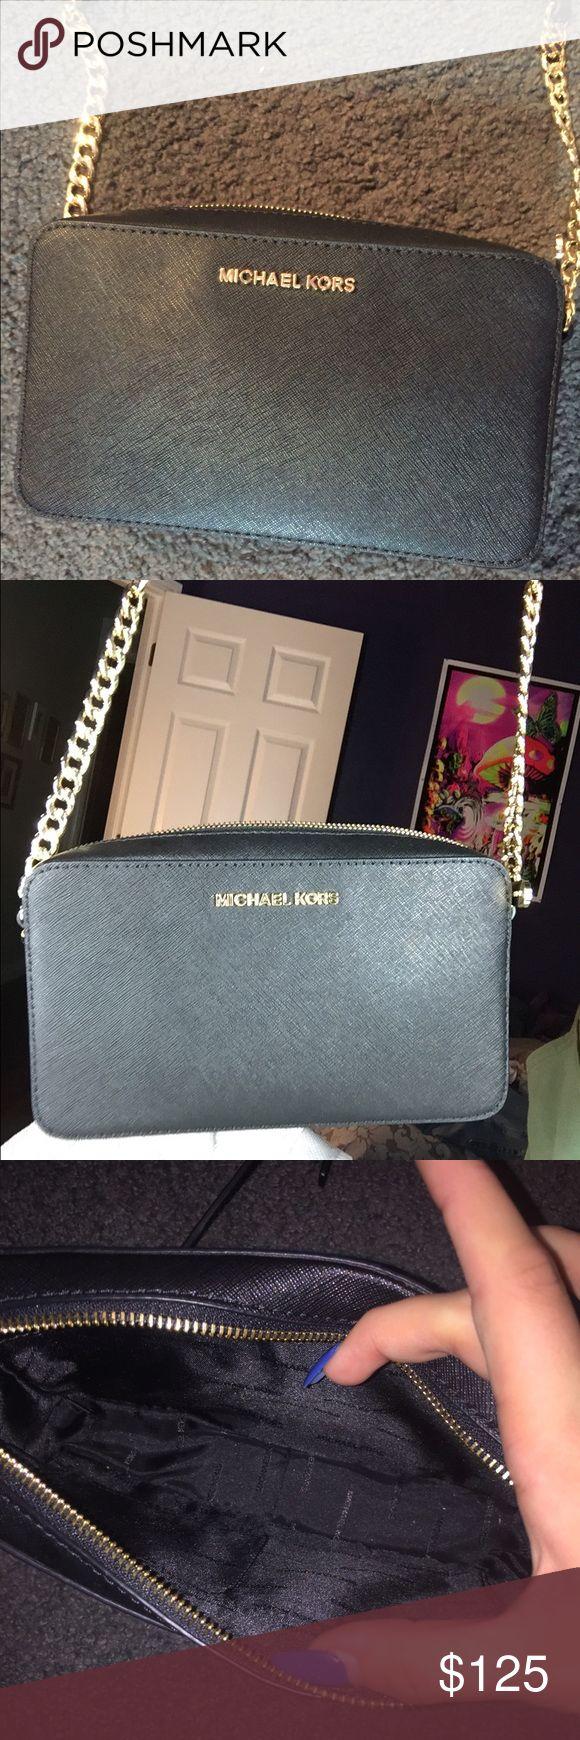 Mickeal Kors Black Crossbody Brand new, NWOT black small crossbody bag. Has long shoulder strap. No stains/scuffs Michael Kors Bags Crossbody Bags